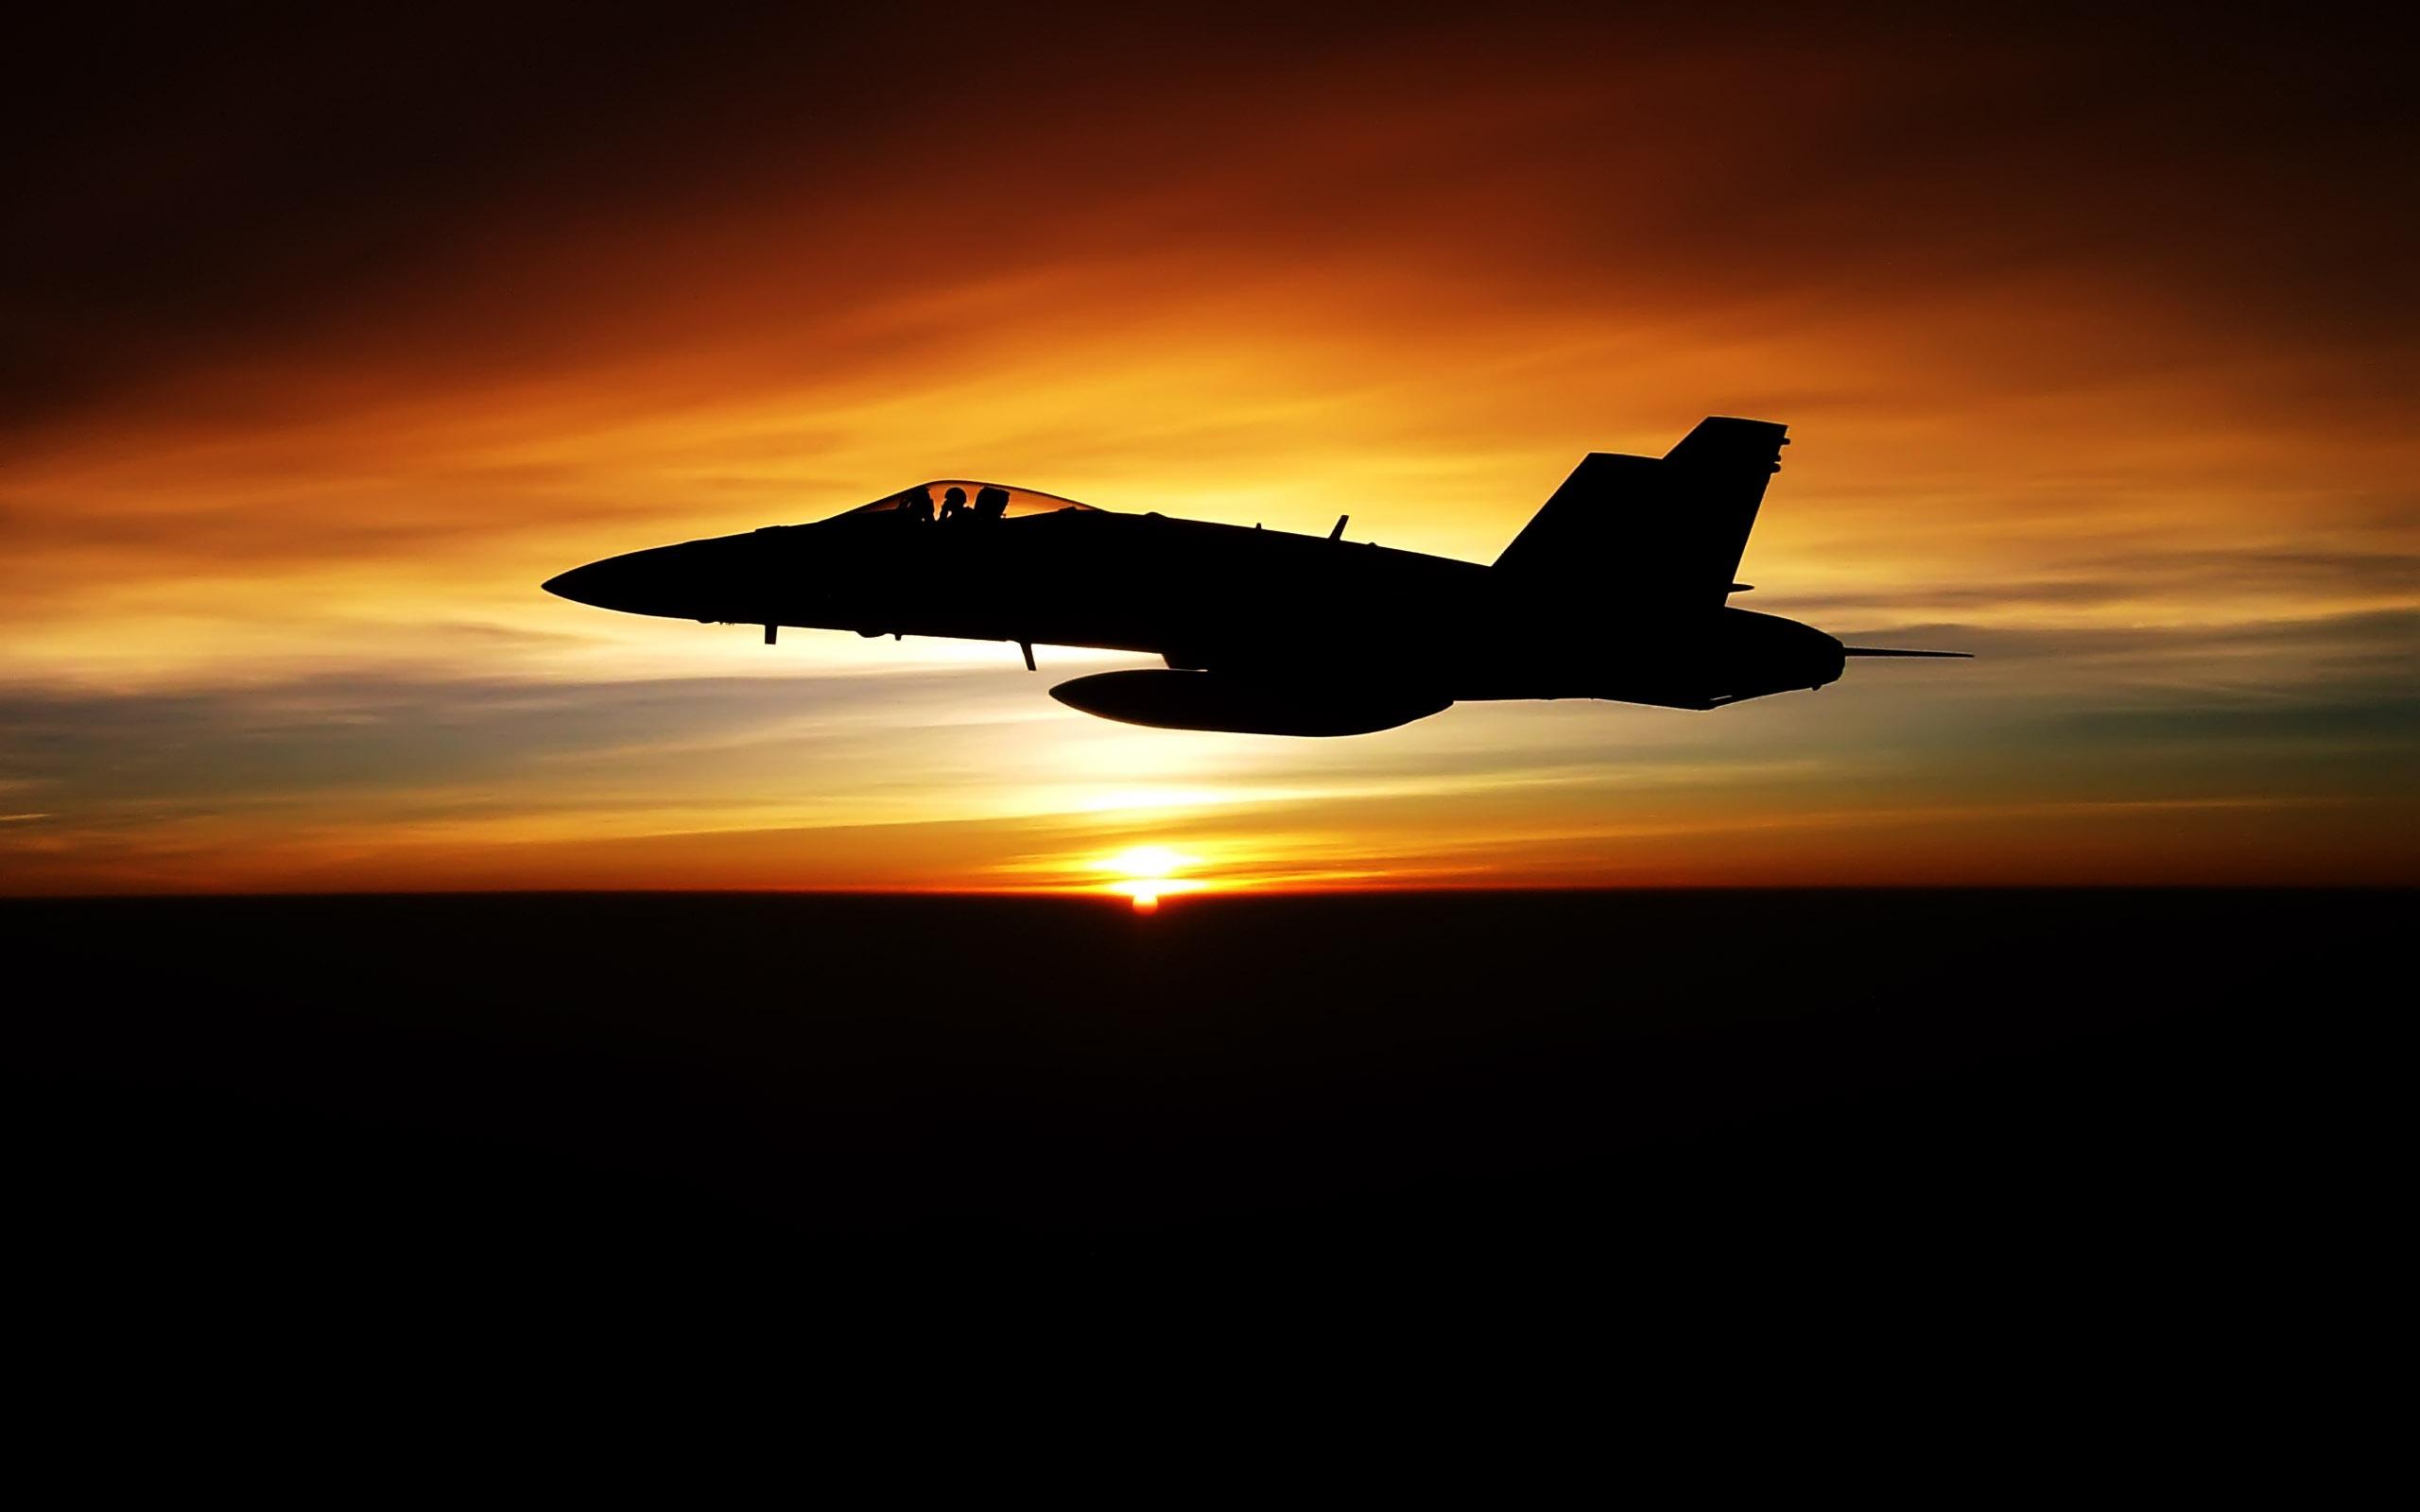 hd wallpaper military aircraft (10) #6 - 2560x1600 wallpaper